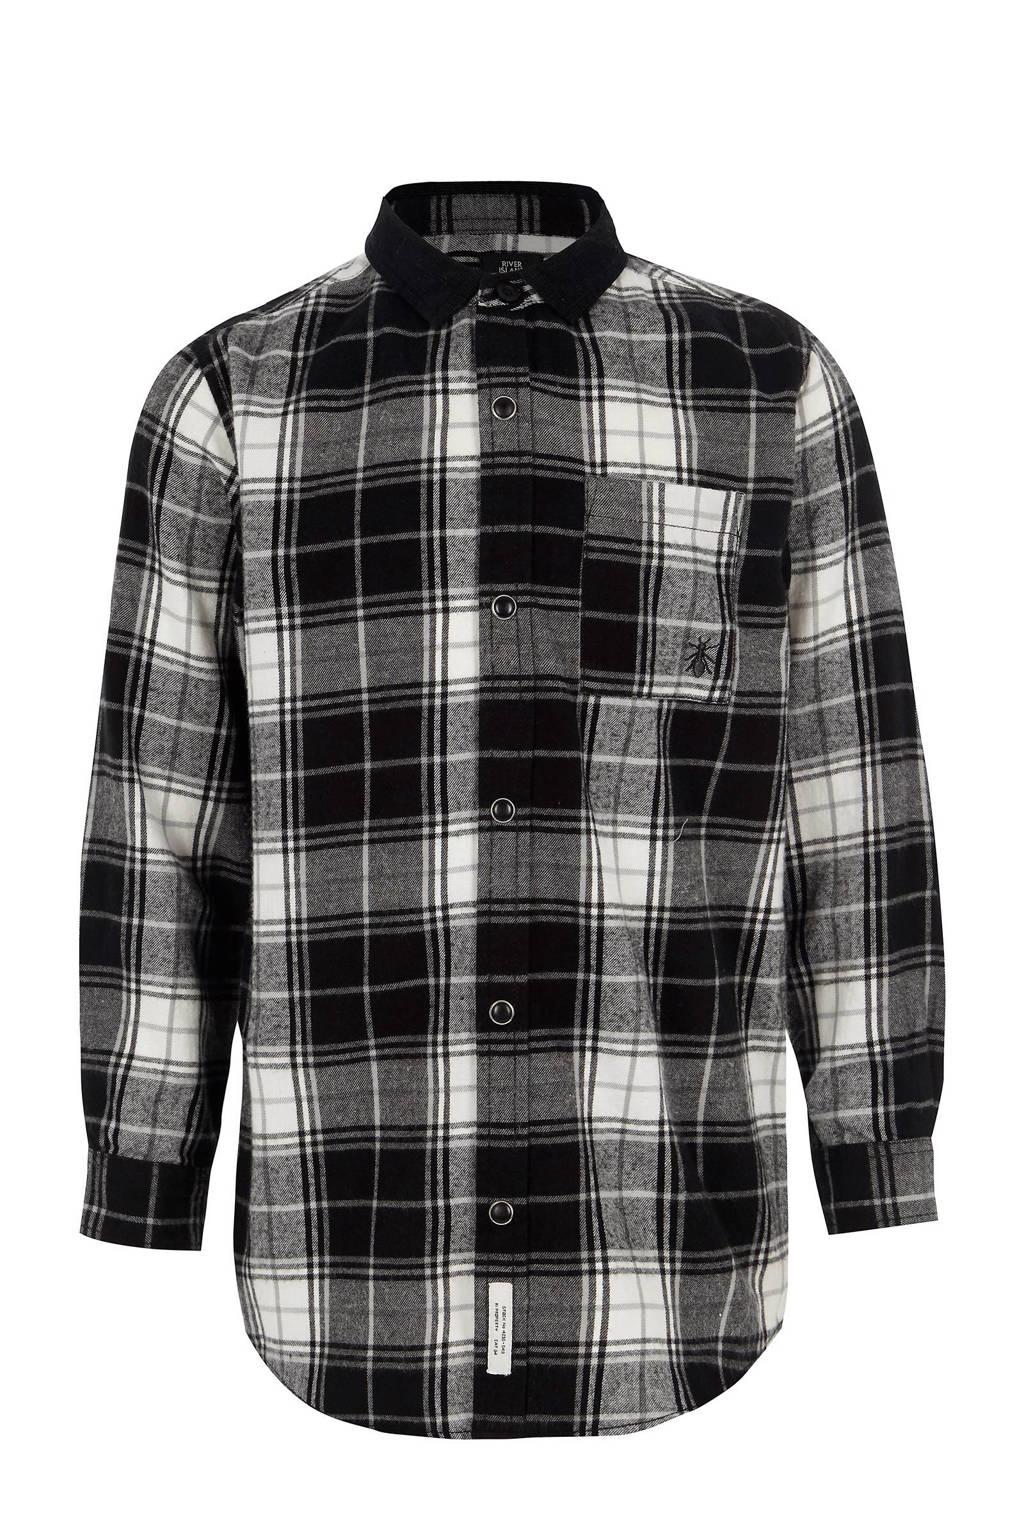 Zwart Wit Geruit Overhemd.River Island Geruit Overhemd Wehkamp